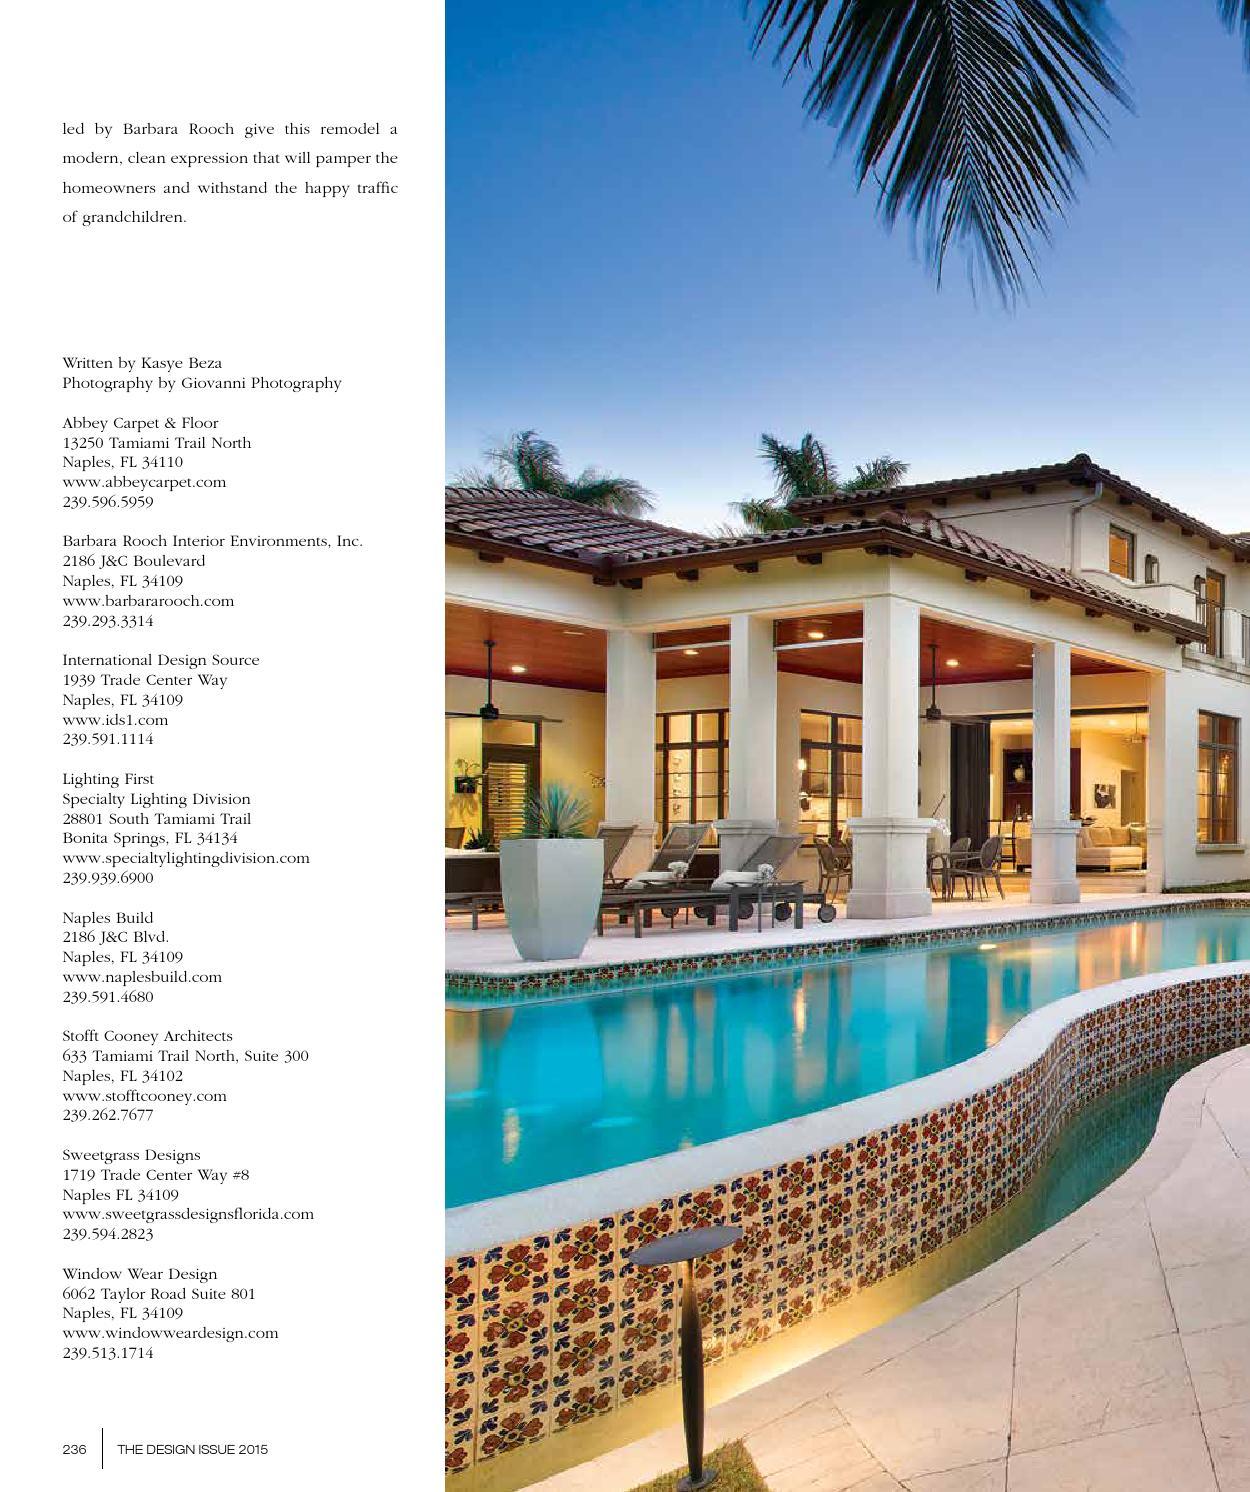 home design magazine design issue 2015 southwest florida edition by jennifer evans issuu